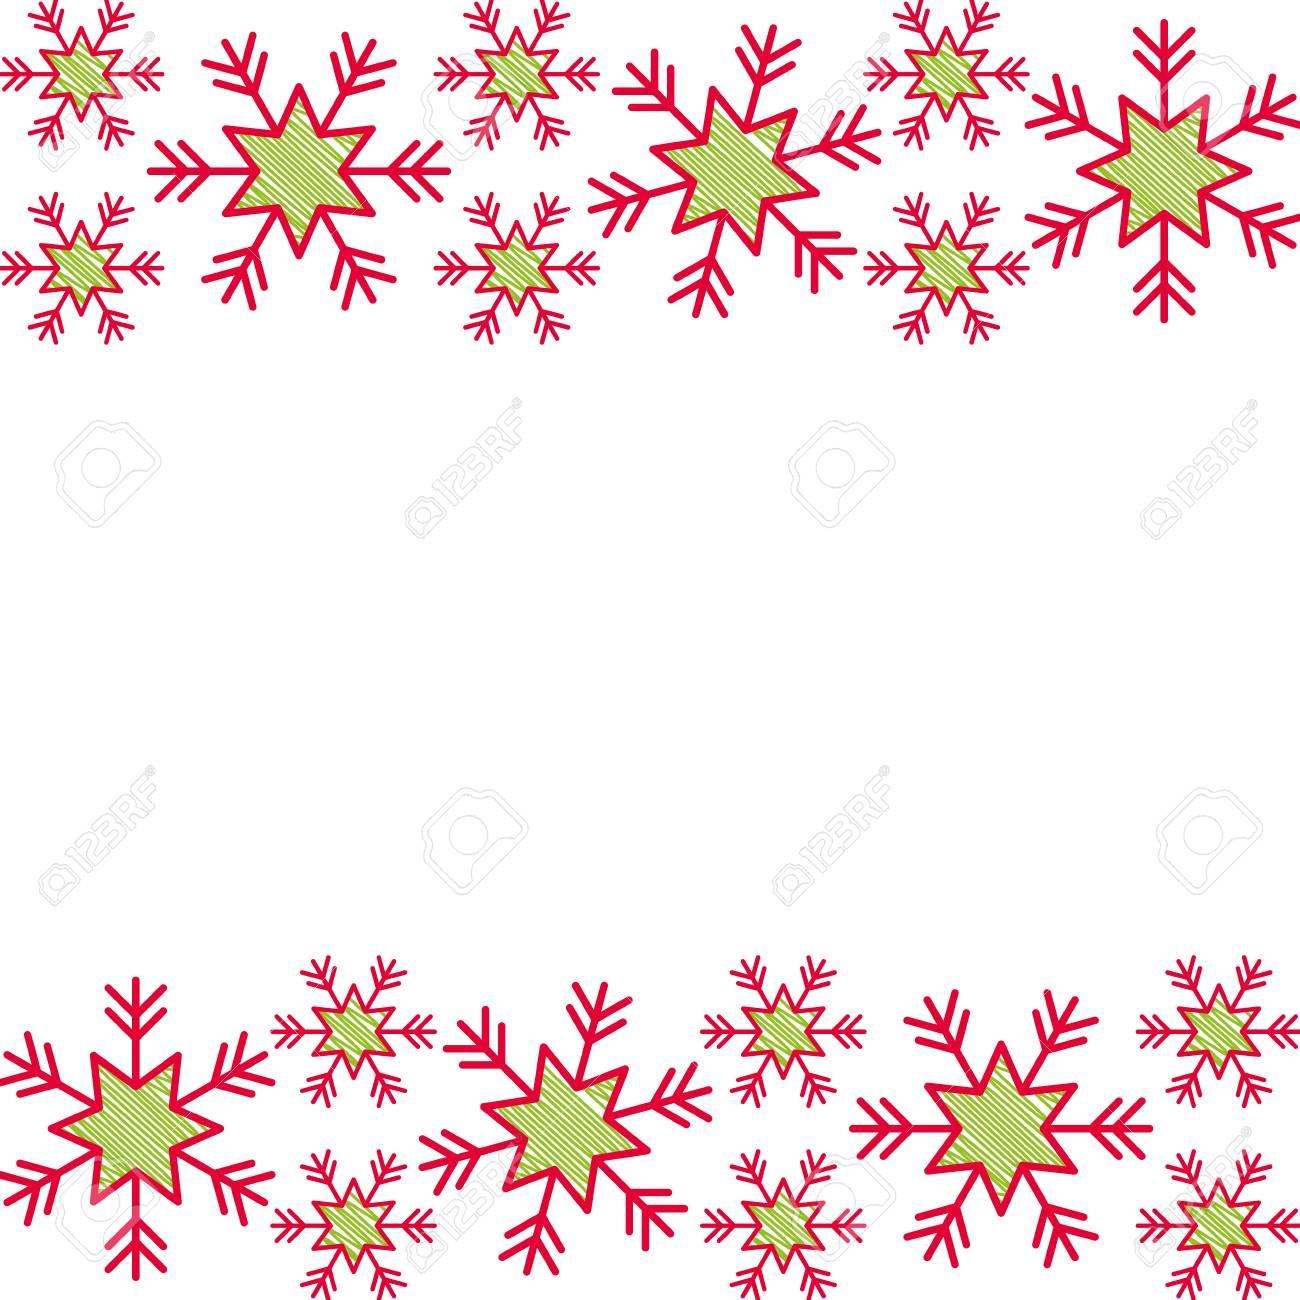 Christmas Border Design.Christmas Border Snowflake Winter Design Background Vector Illustration